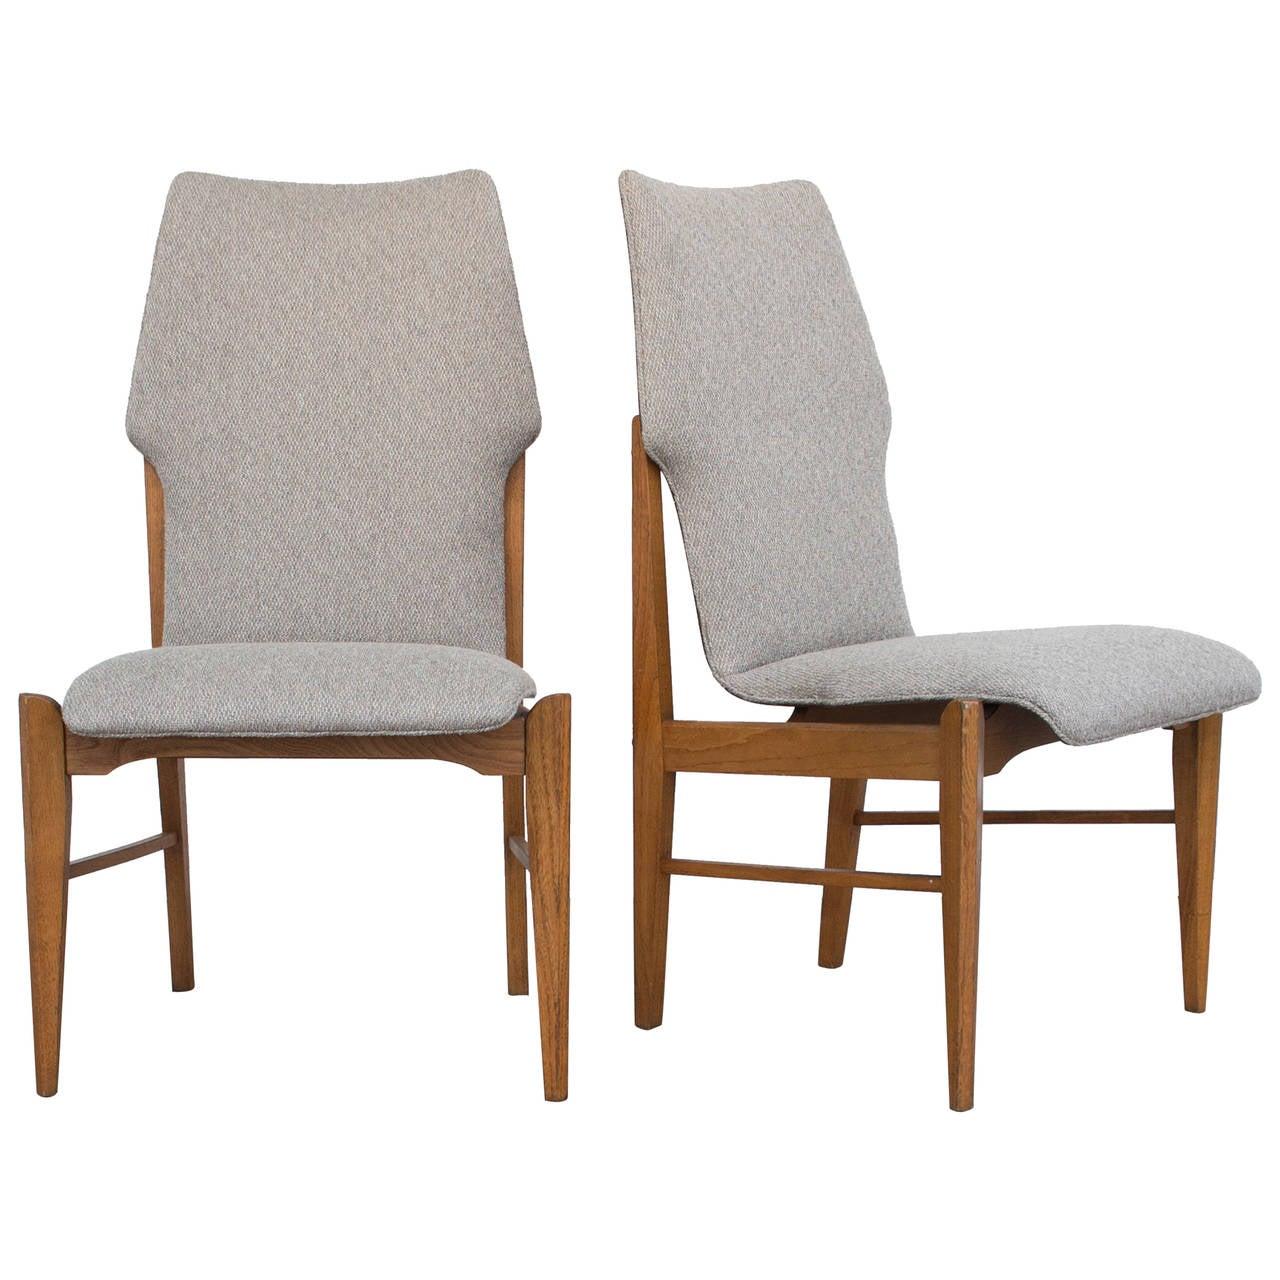 danish modern dining chair covers geelong four kodawood chairs at 1stdibs